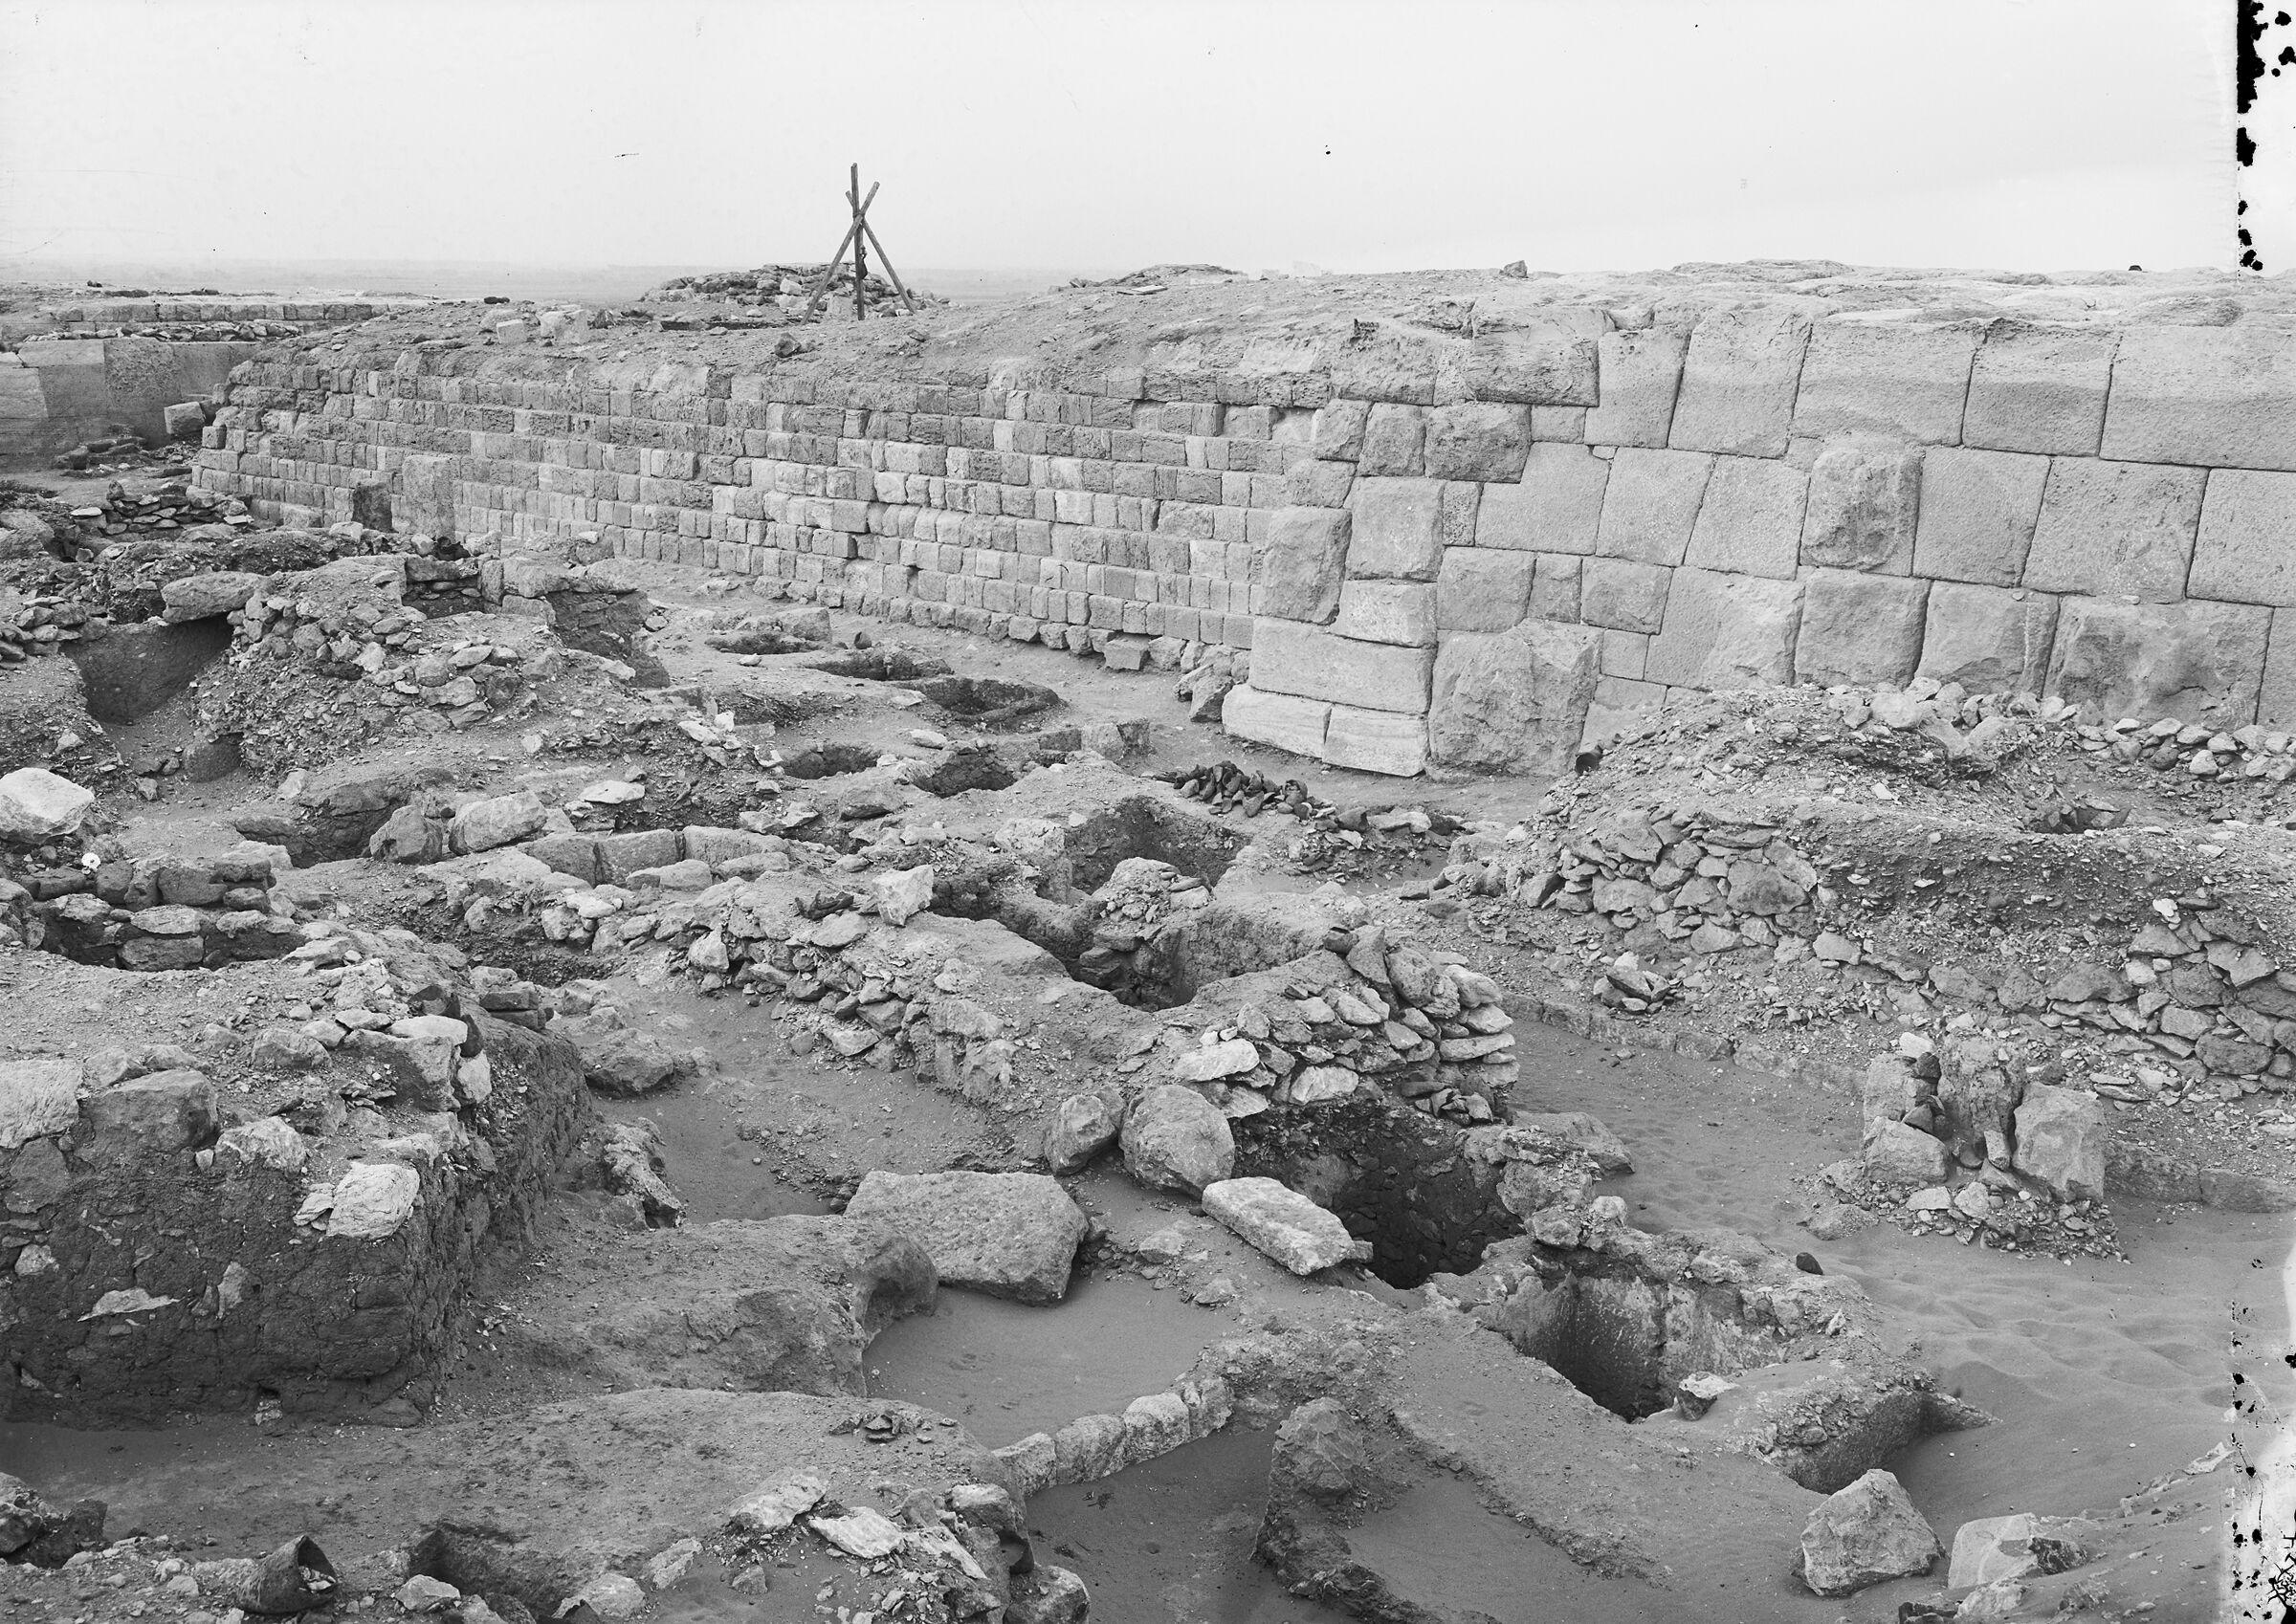 Western Cemetery: Site: Giza; View: G 2100, G 2100-I, G 2017, G 2024, G 2016, G 2020